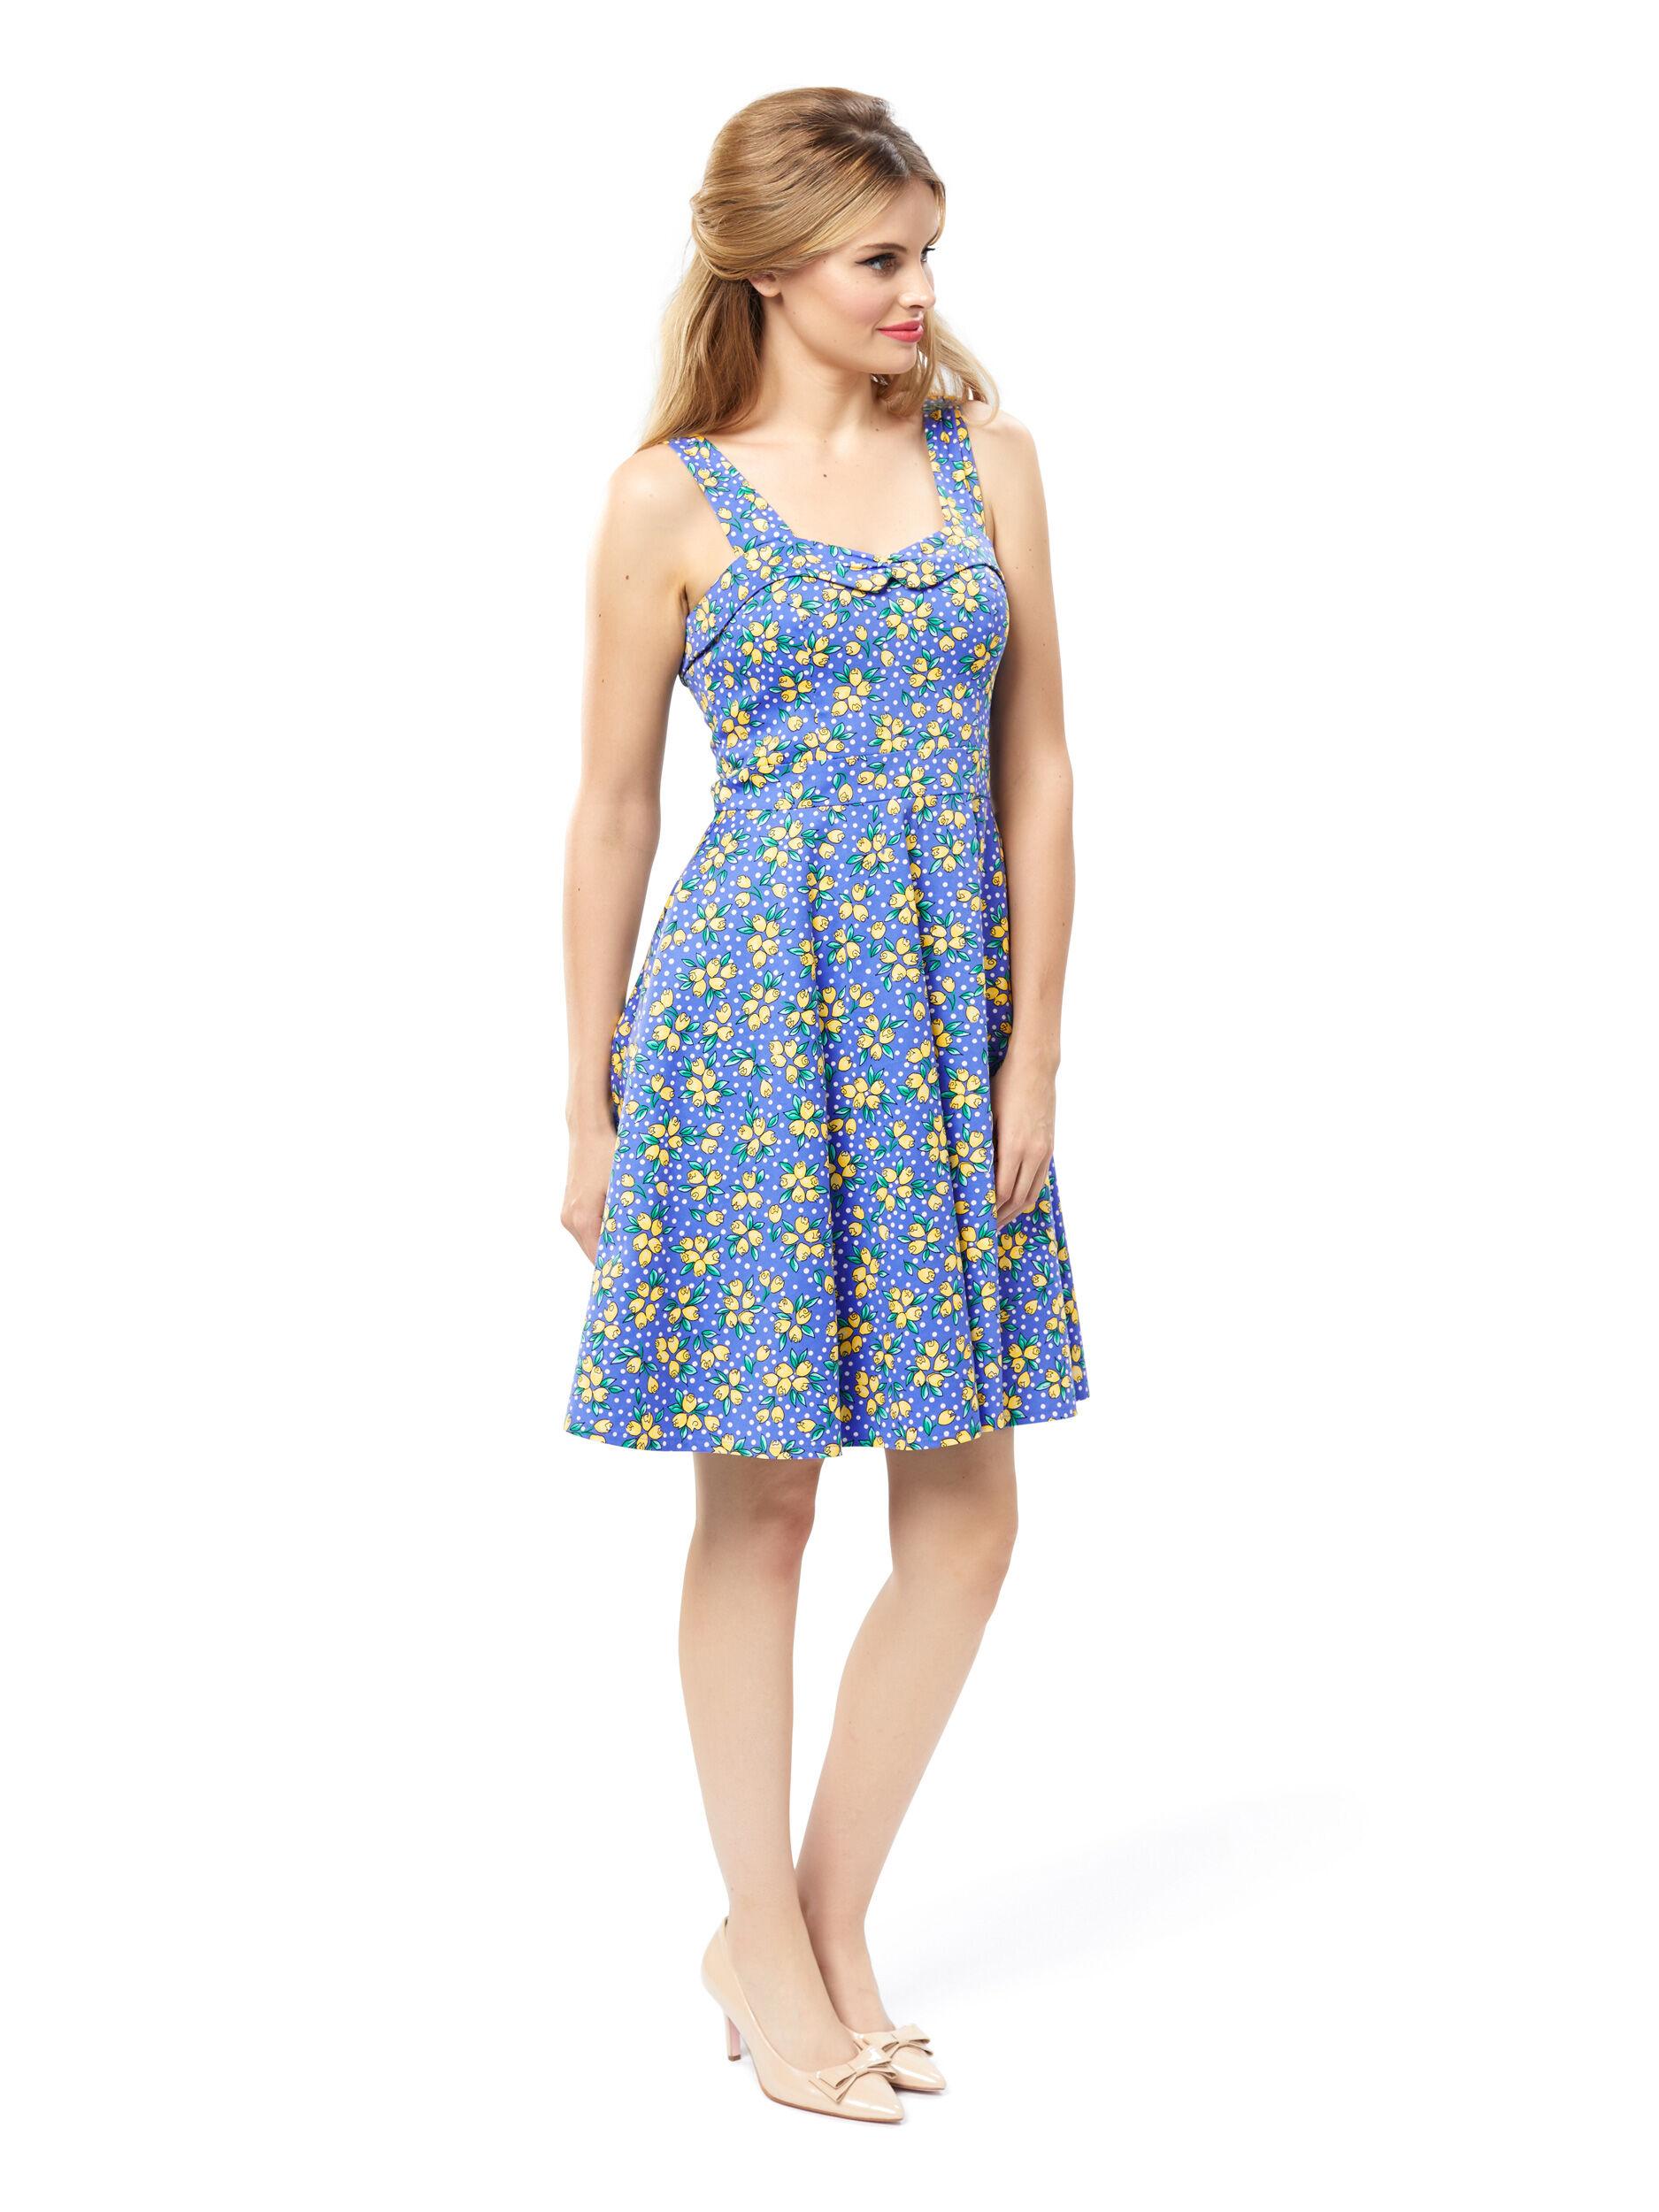 Sweet Lemonade Dress